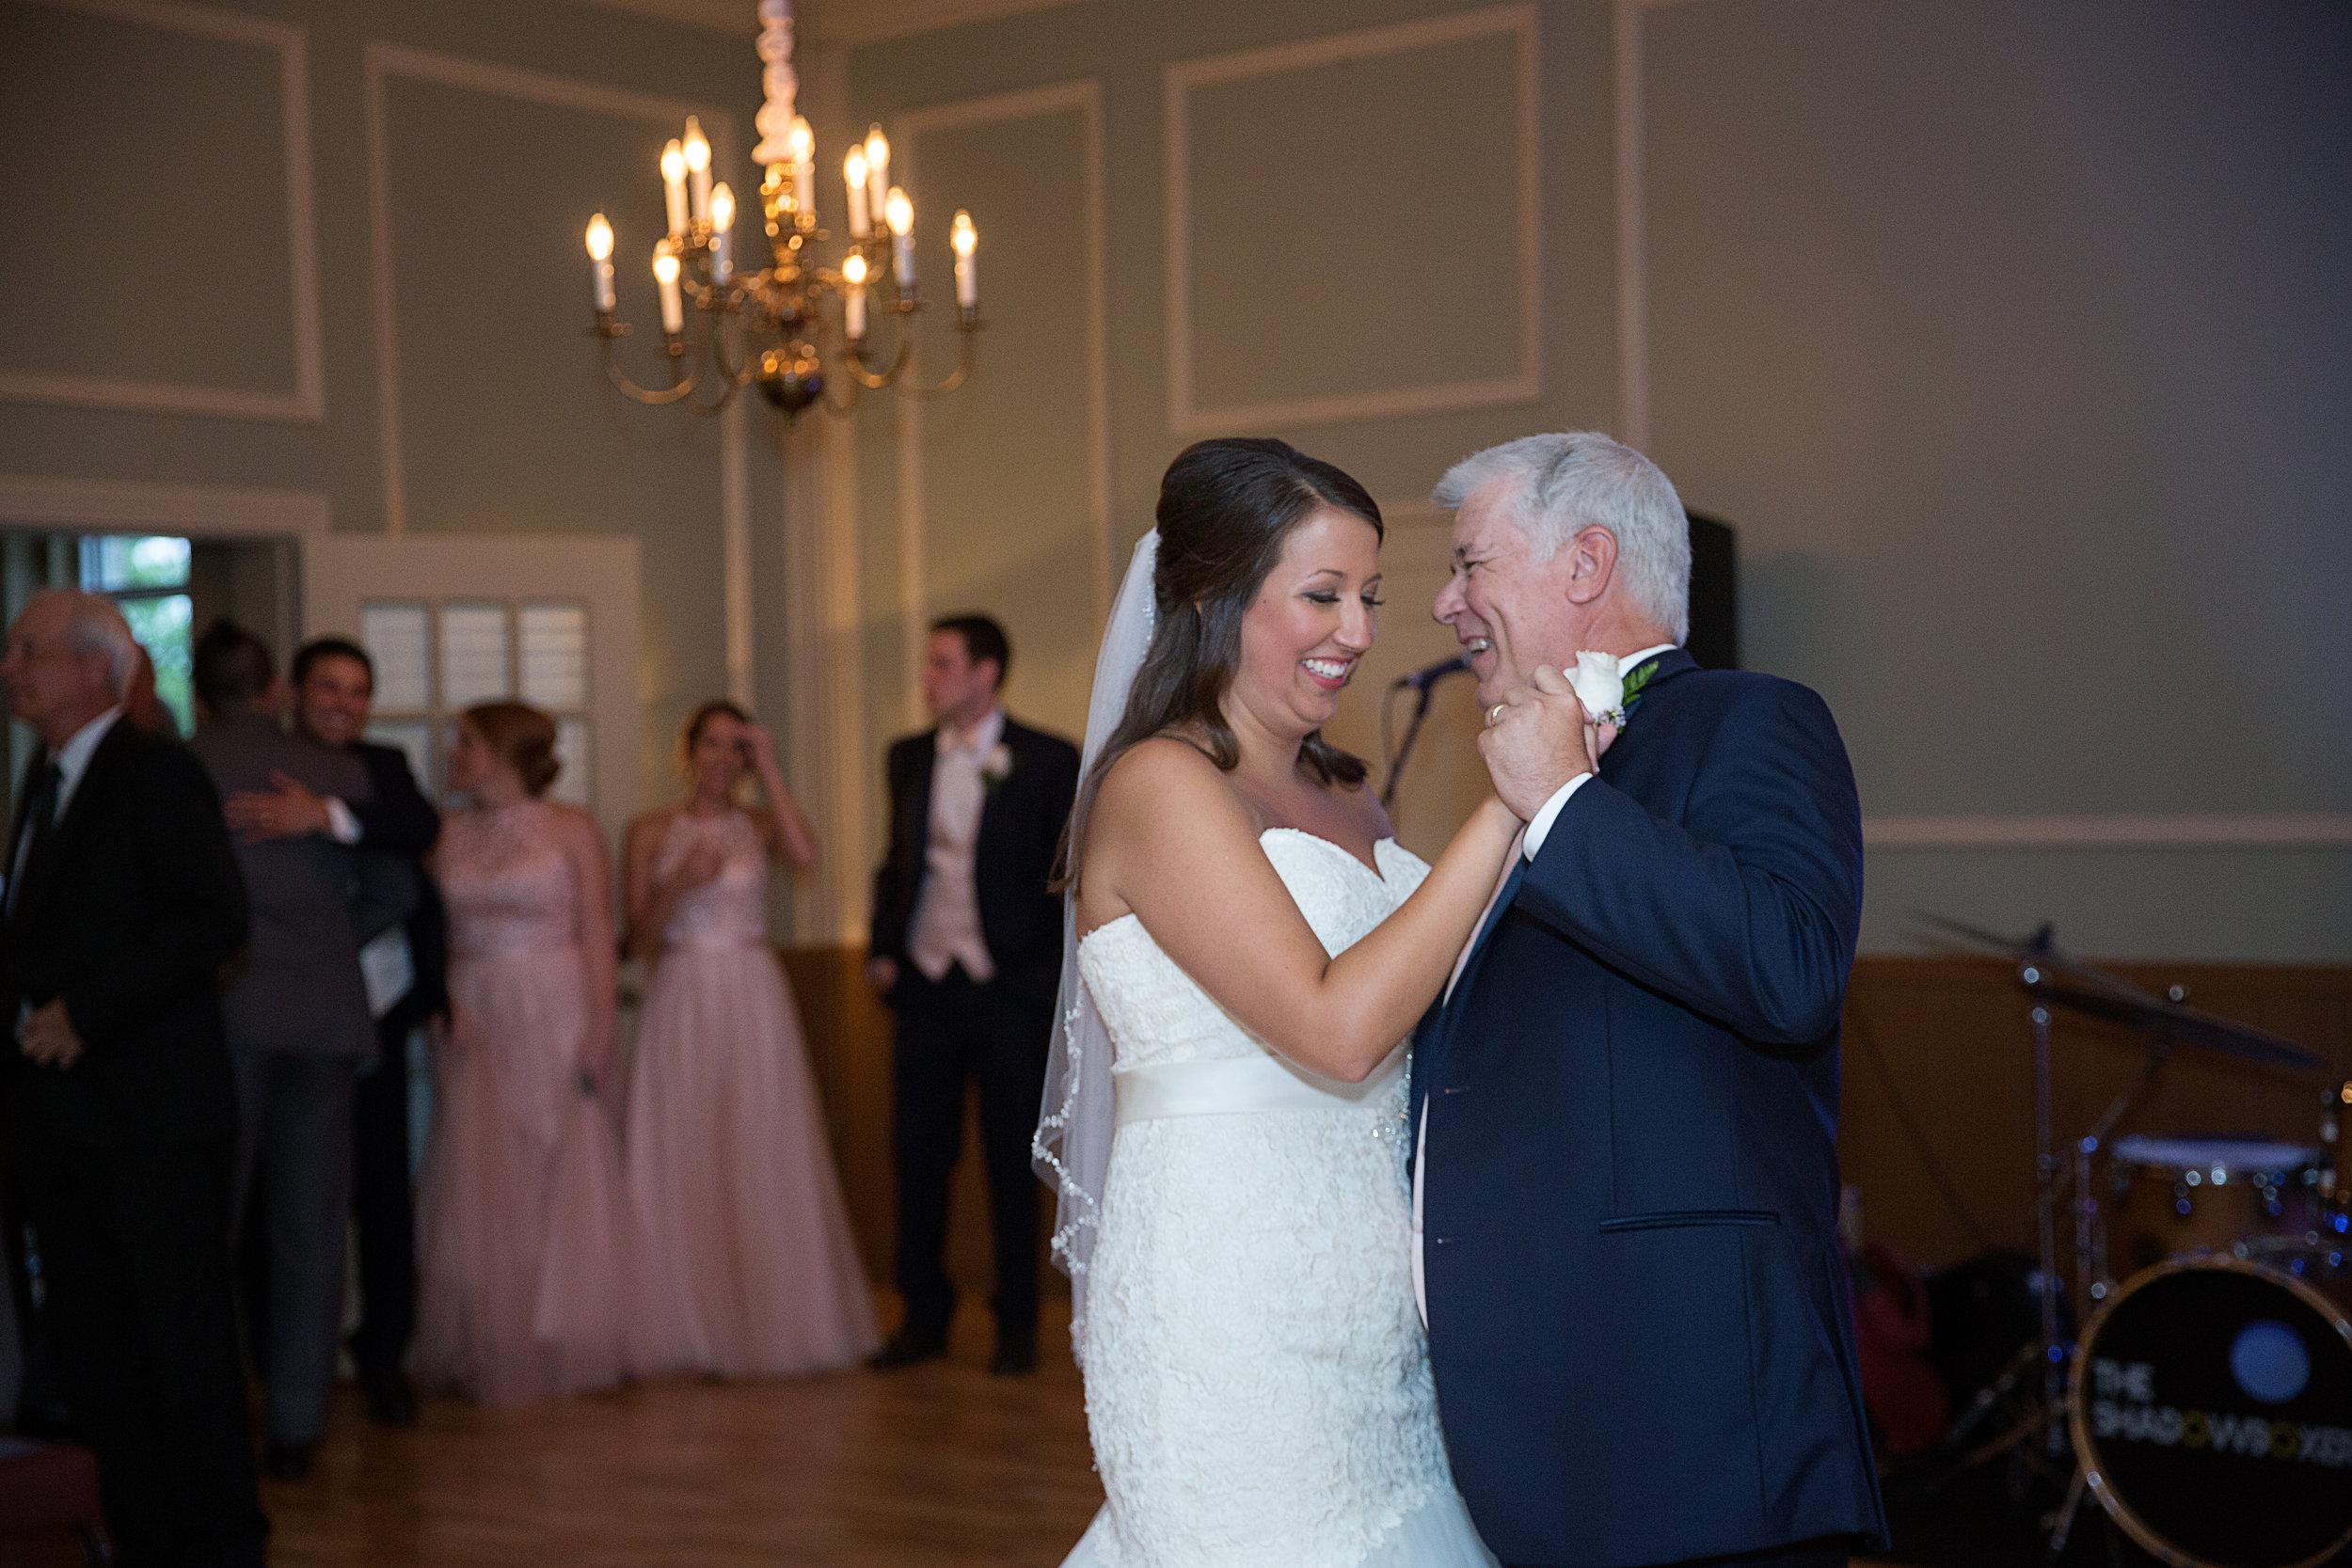 Southall Wedding 0622.jpg